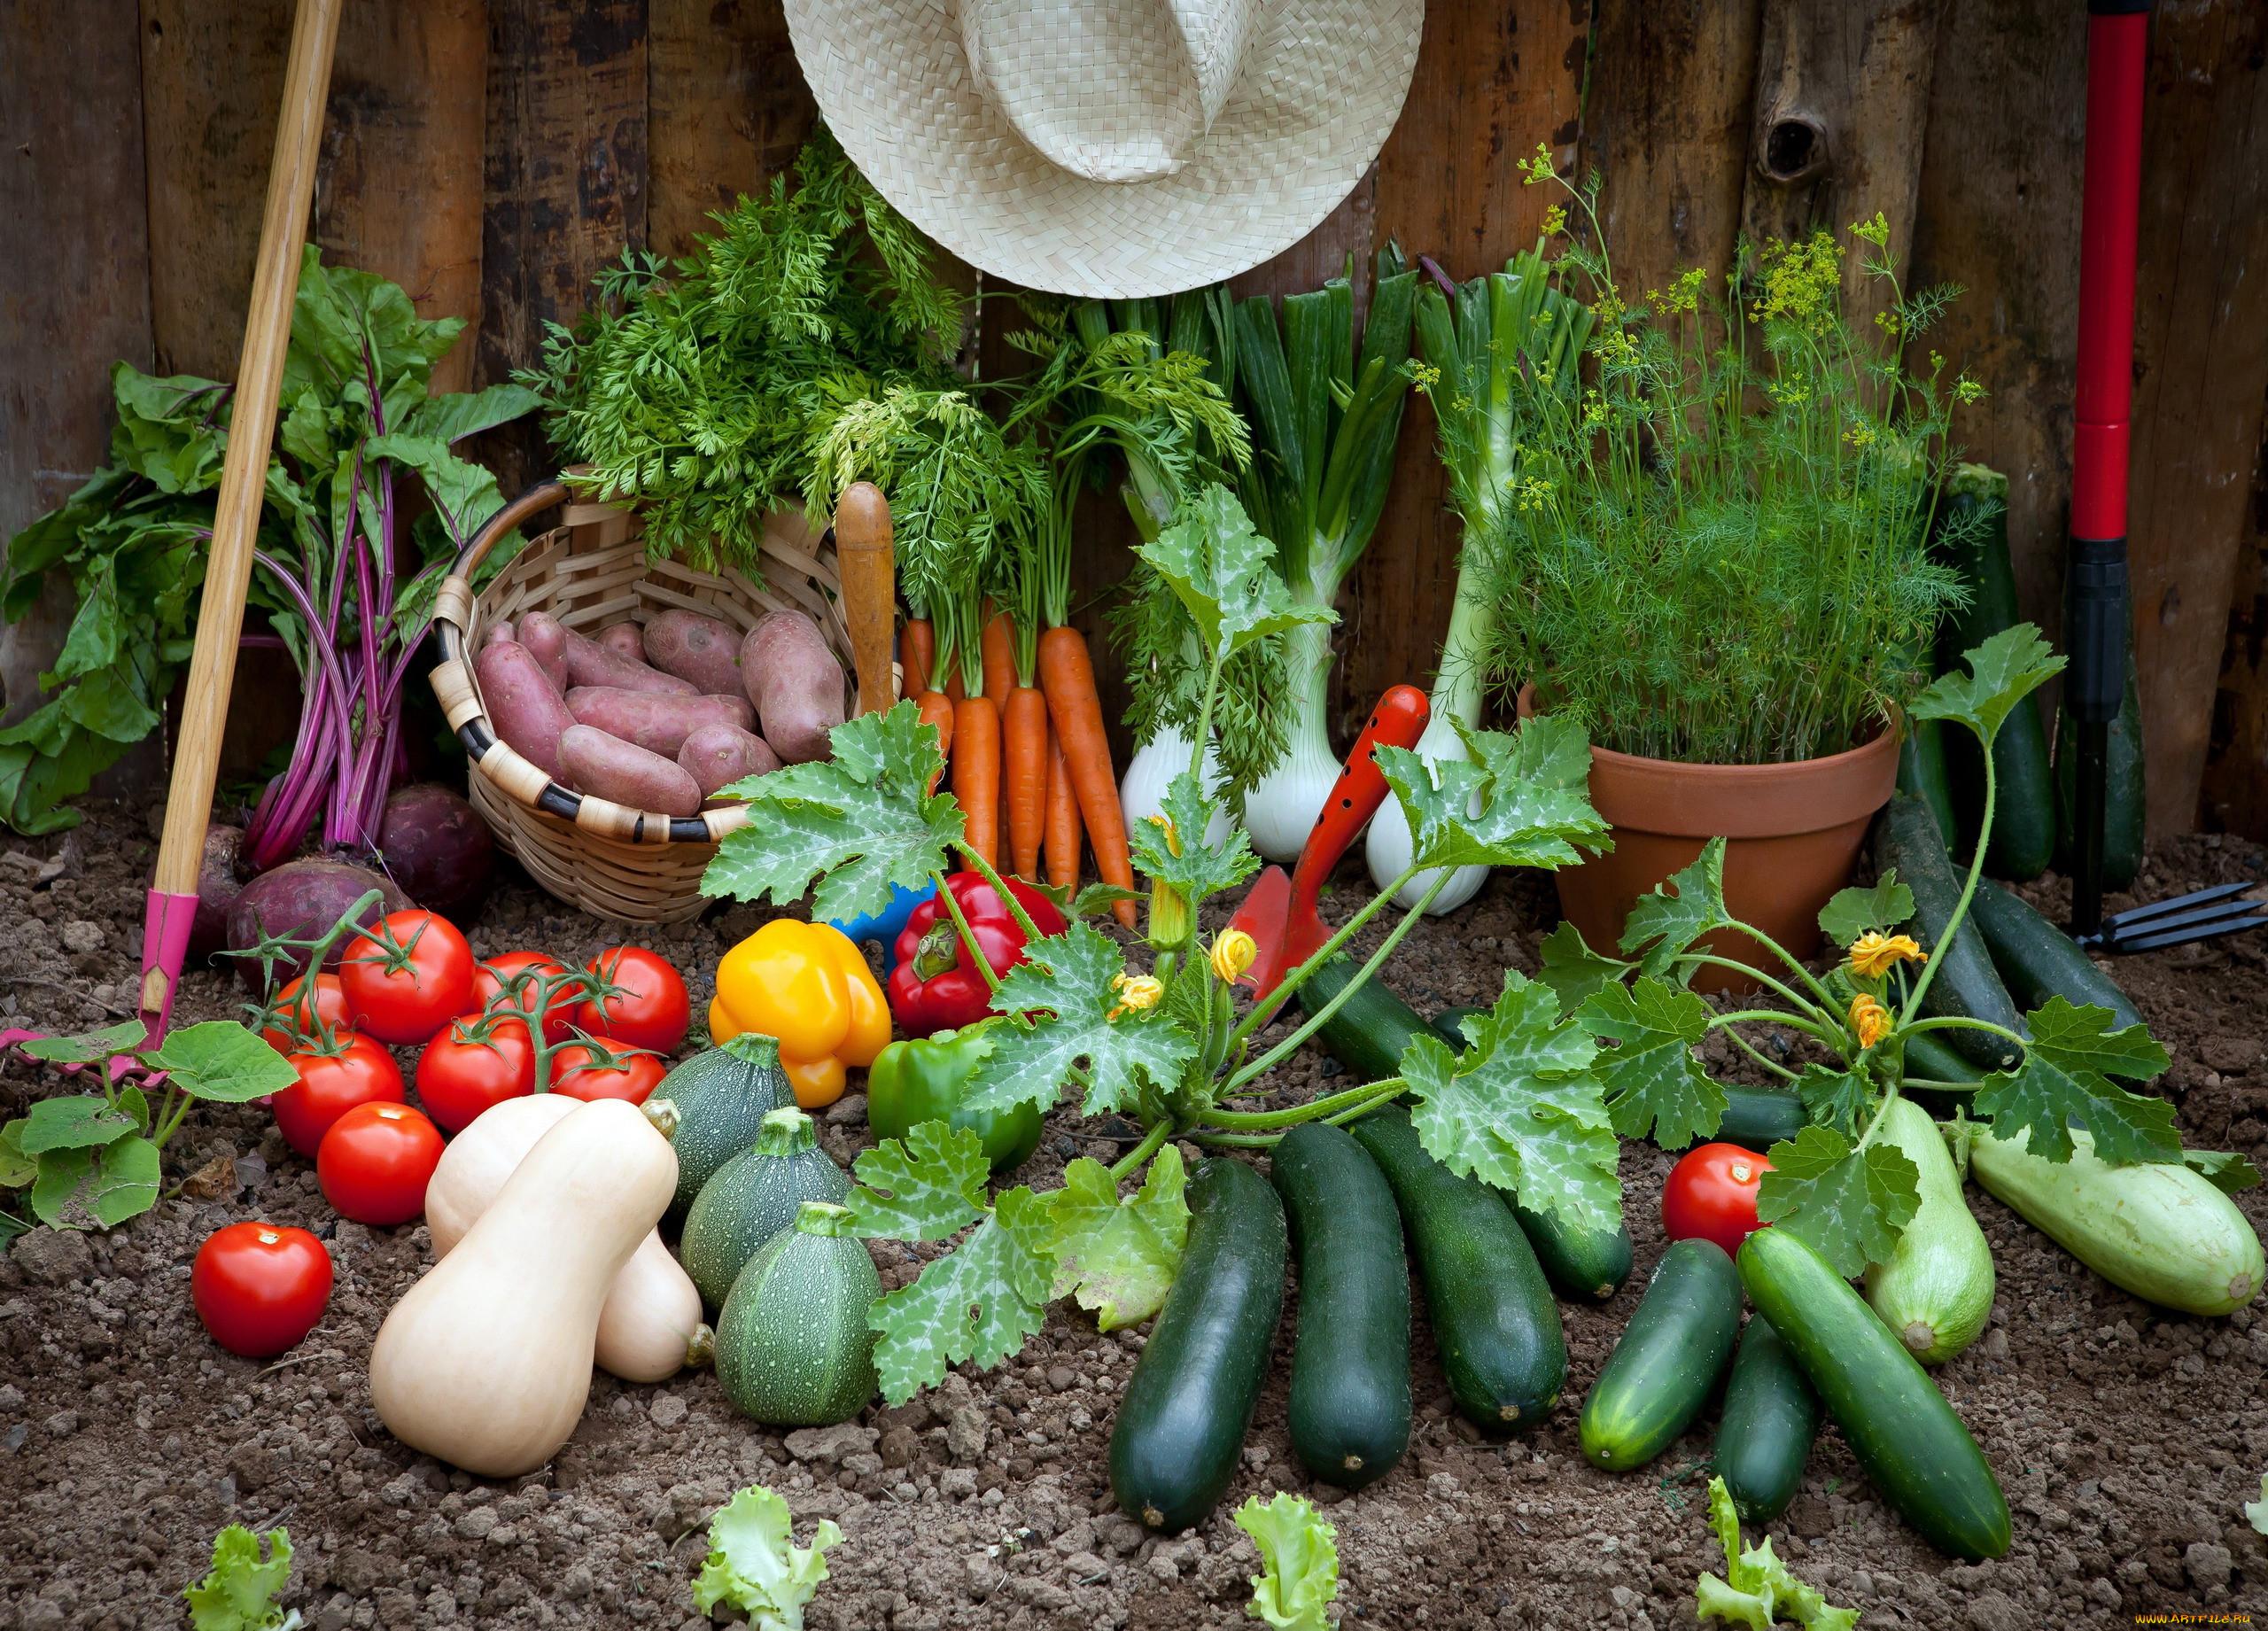 картинки овощное царство этого, можете